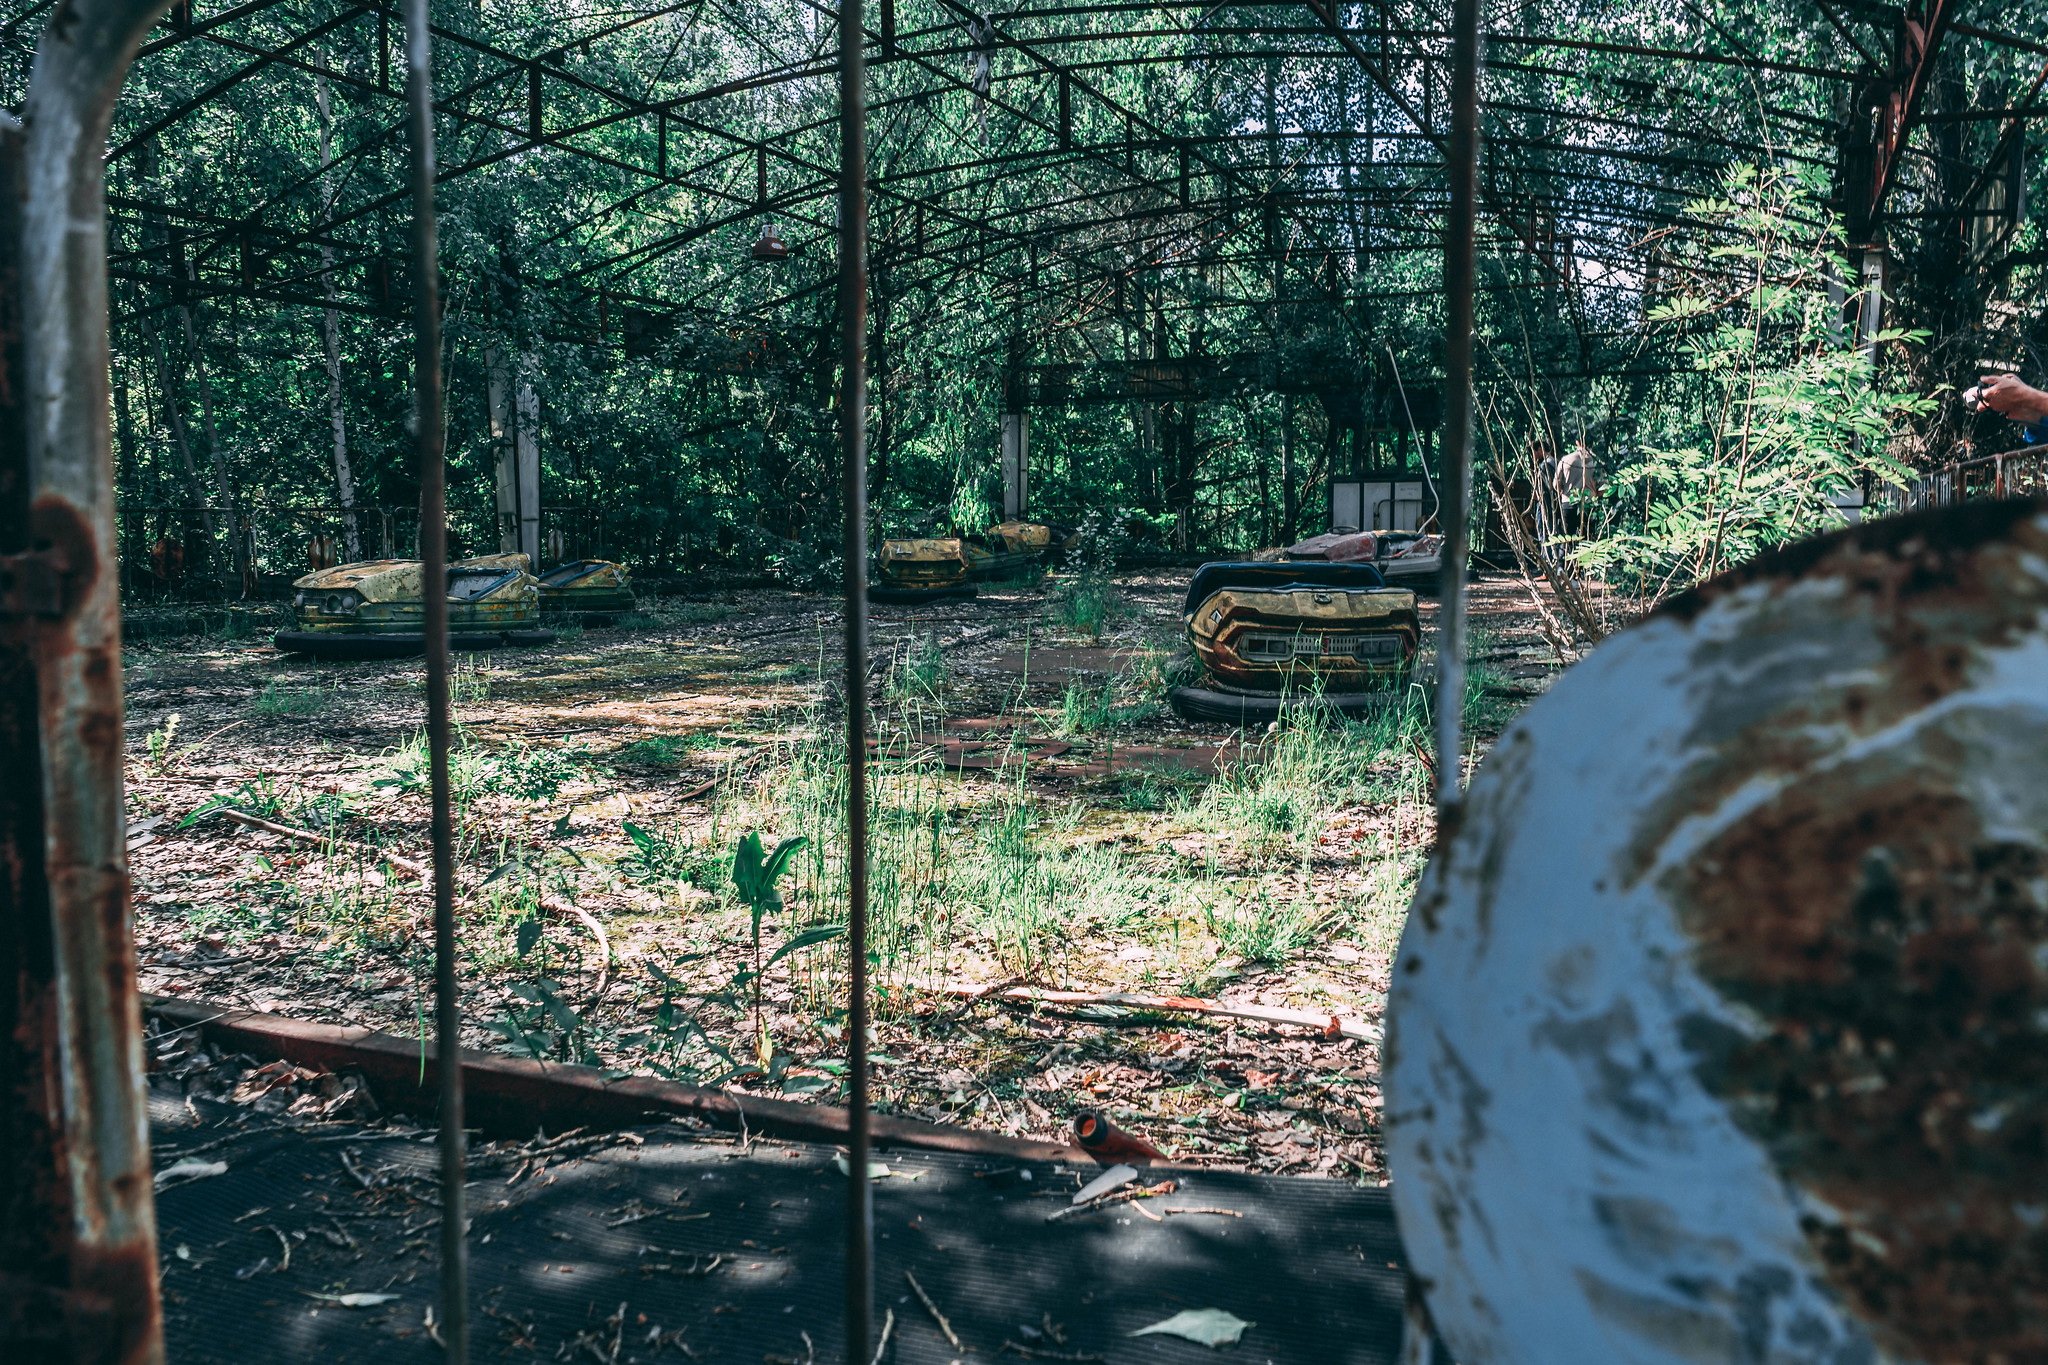 Prypyat Fairground